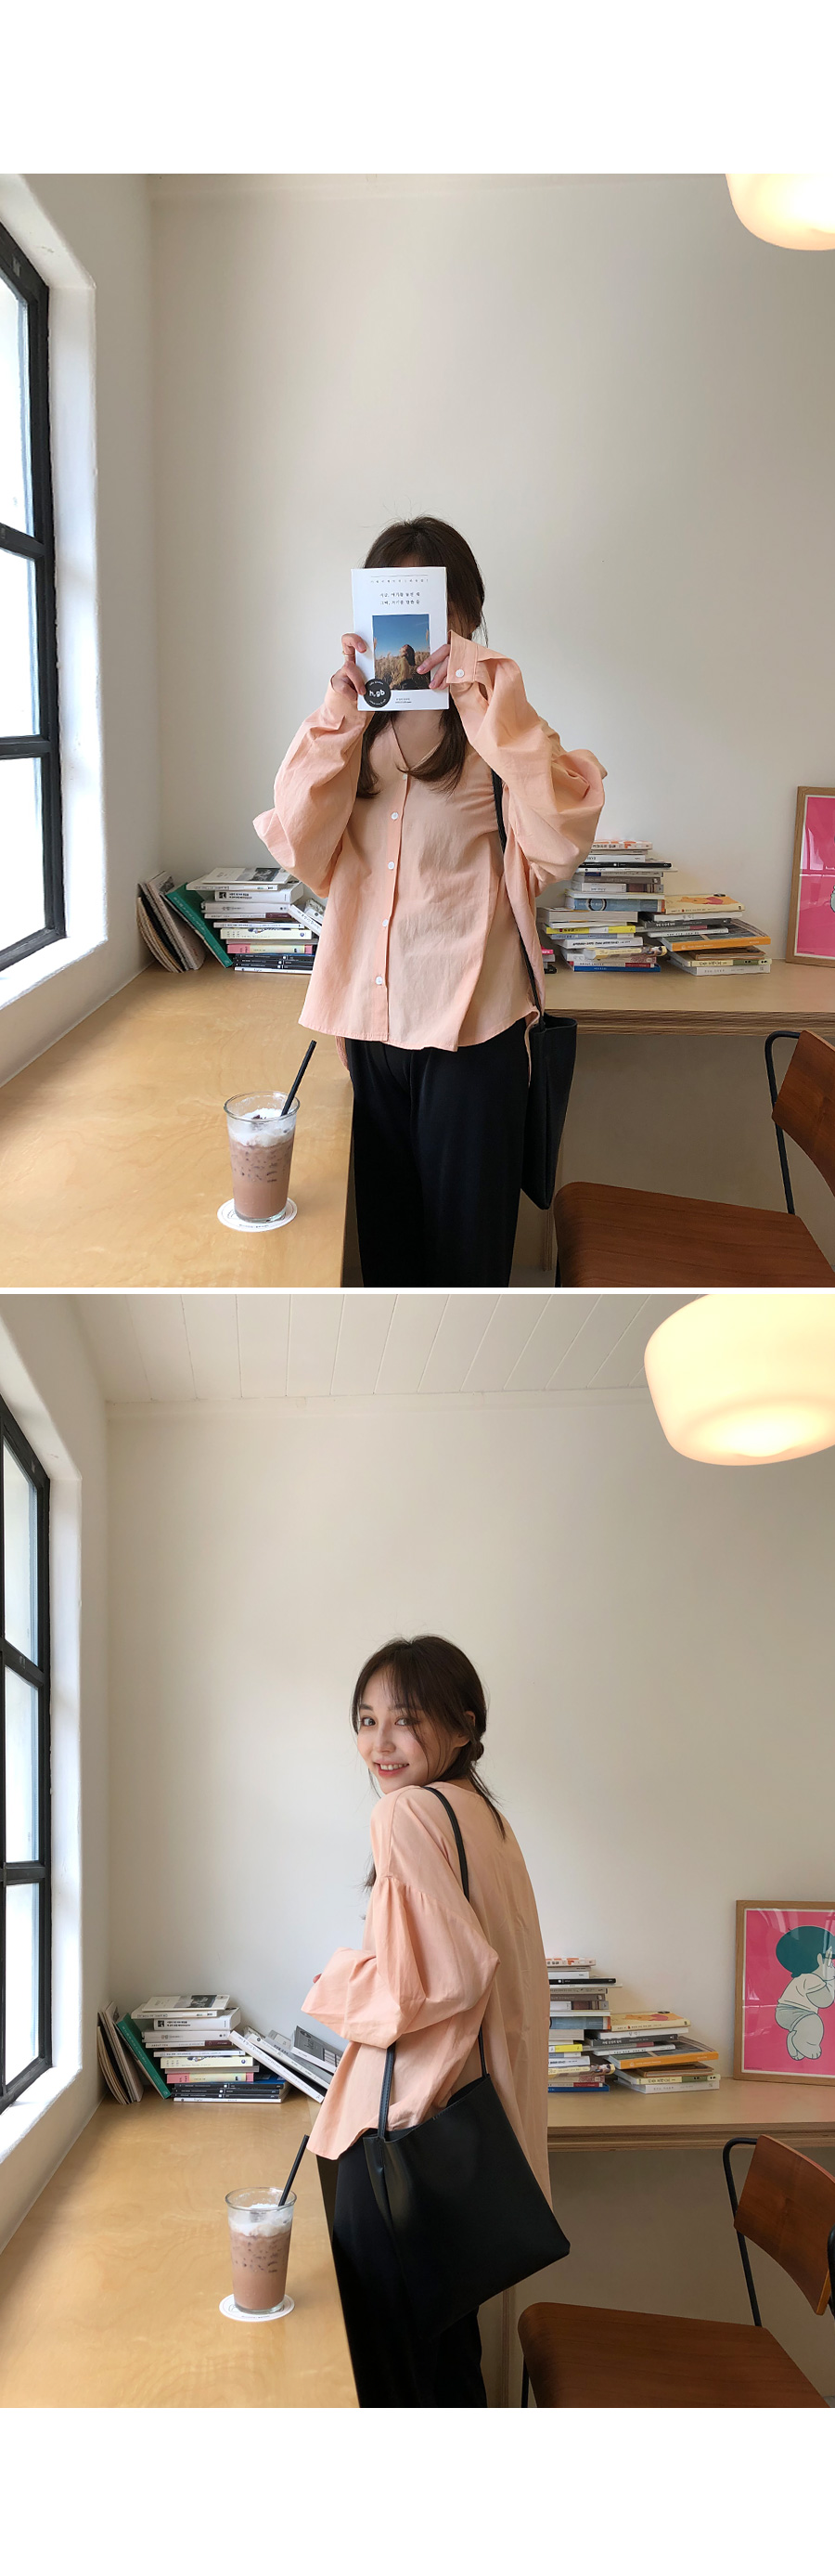 Peach v neck blouse